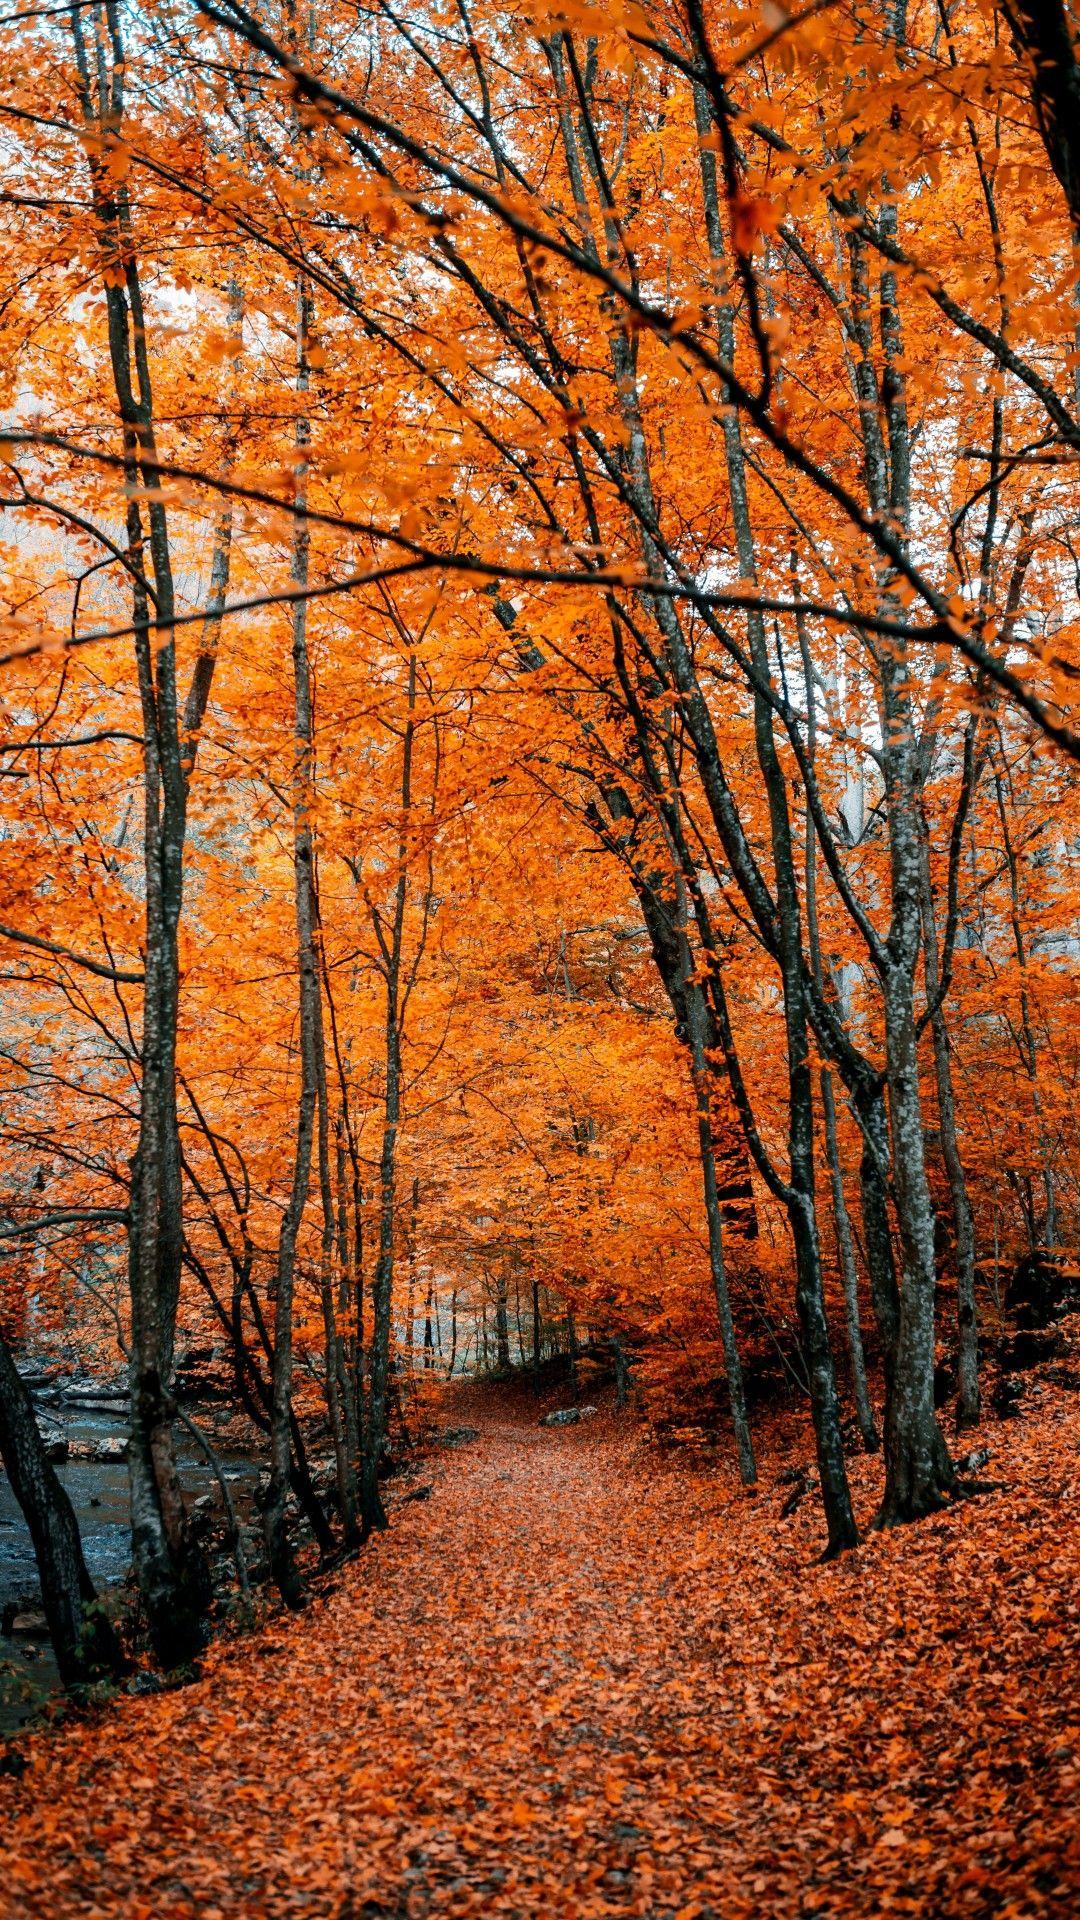 Autumn, Path, Forest, Trees, Fall #fallscenery